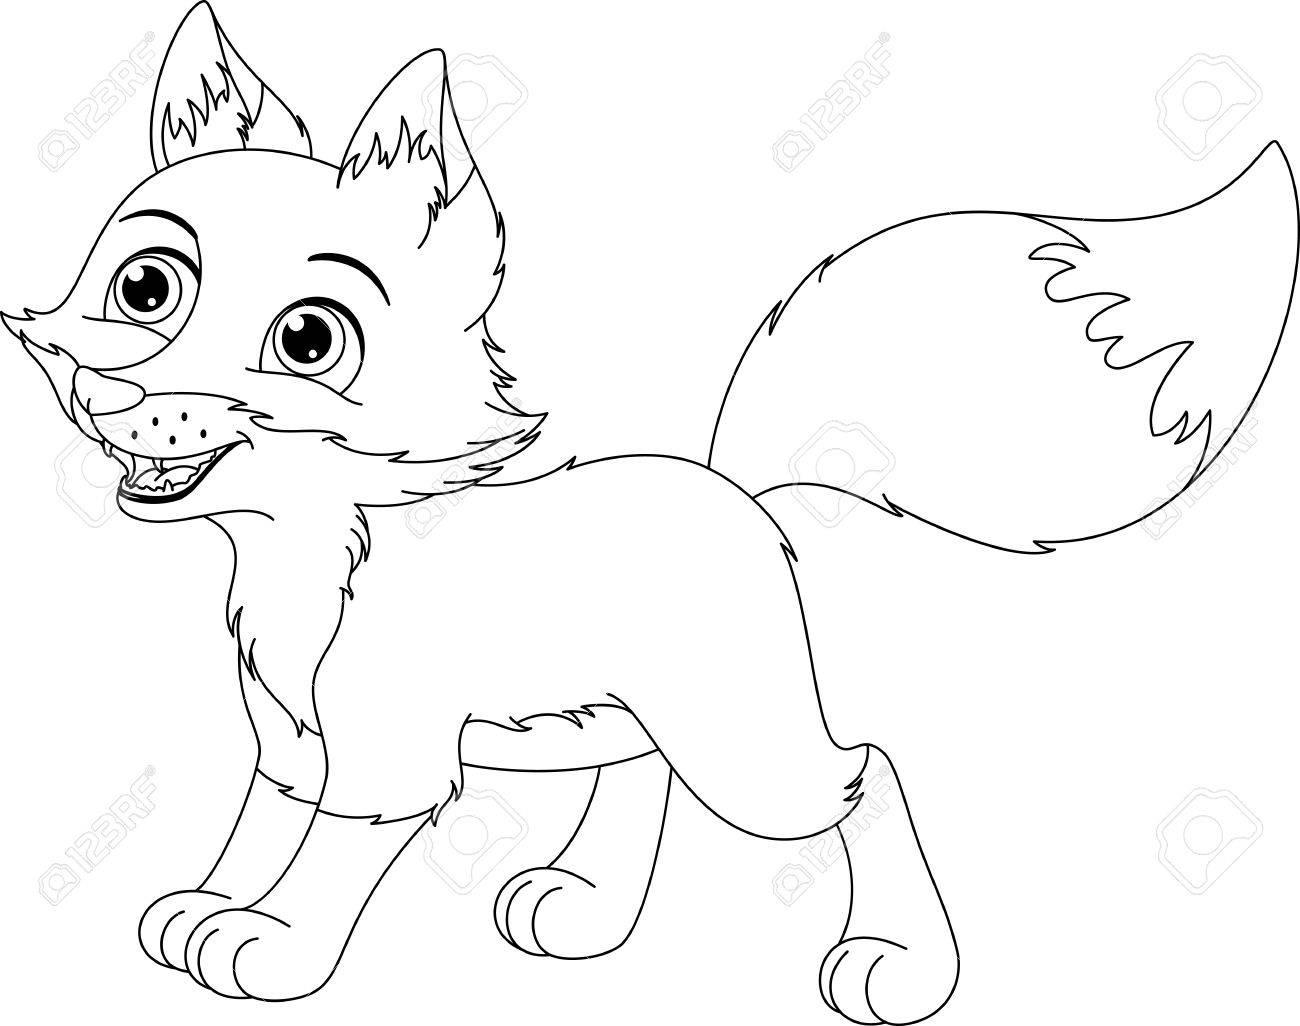 Excelente Fox Para Colorear Ornamento - Dibujos Para Colorear En ...